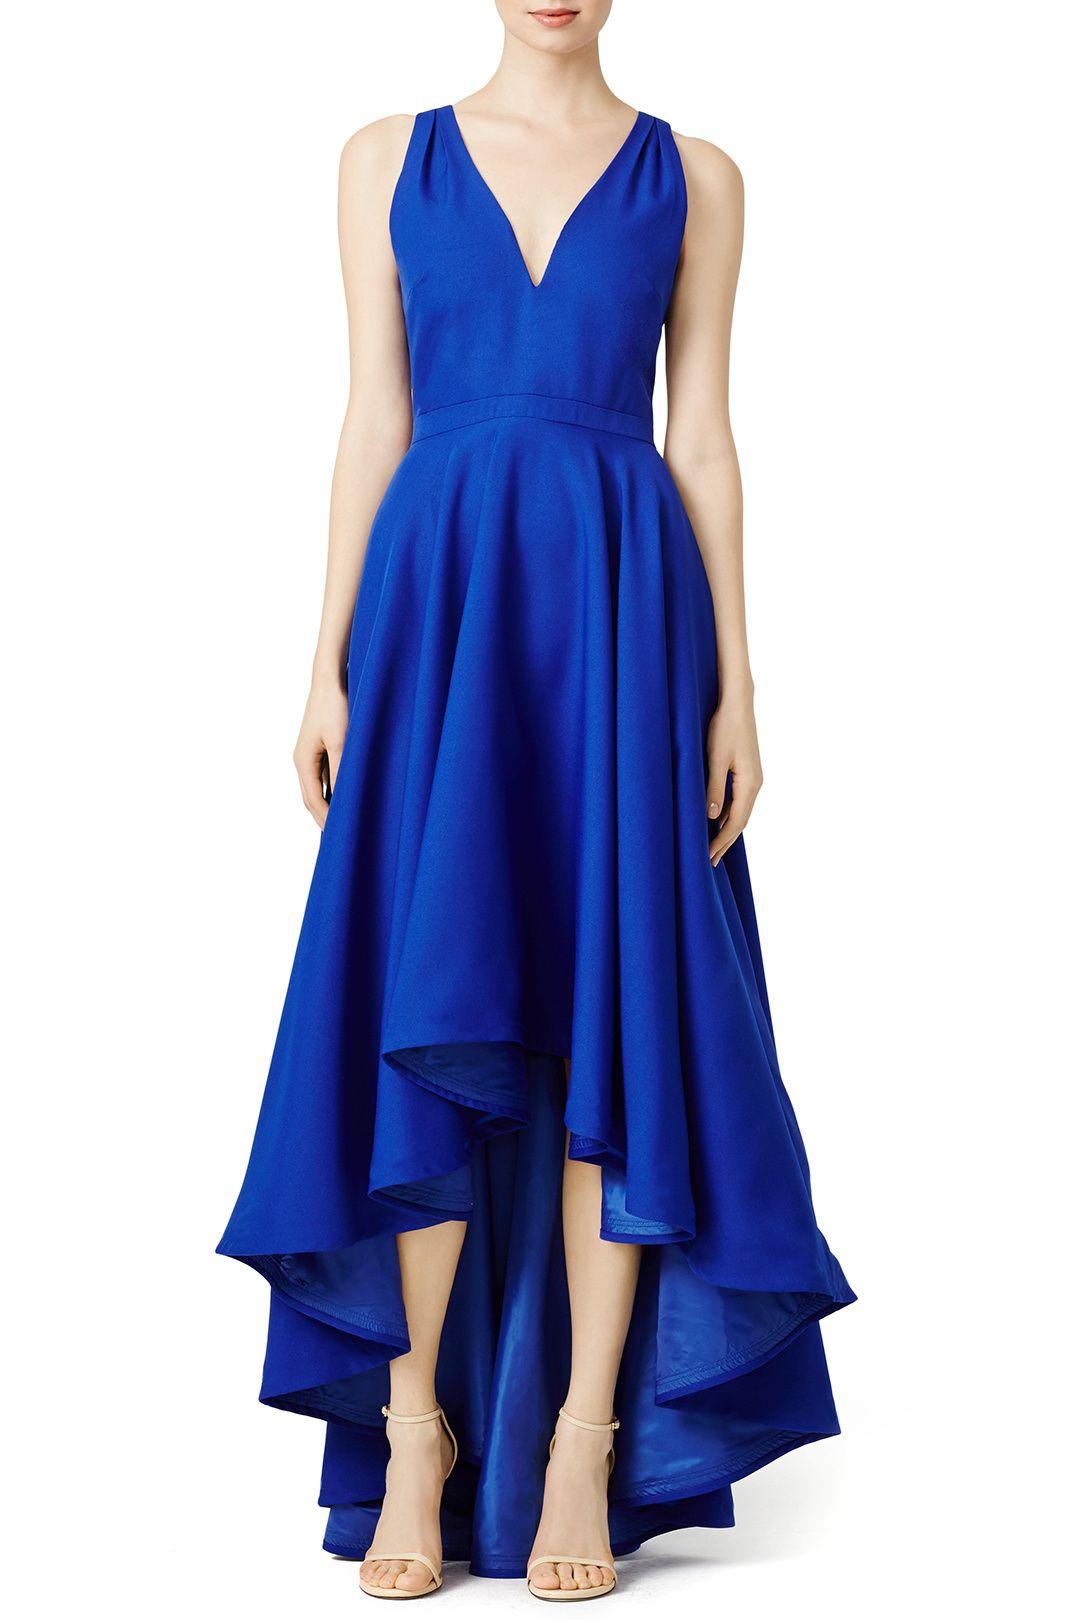 Rent Blue Dresses